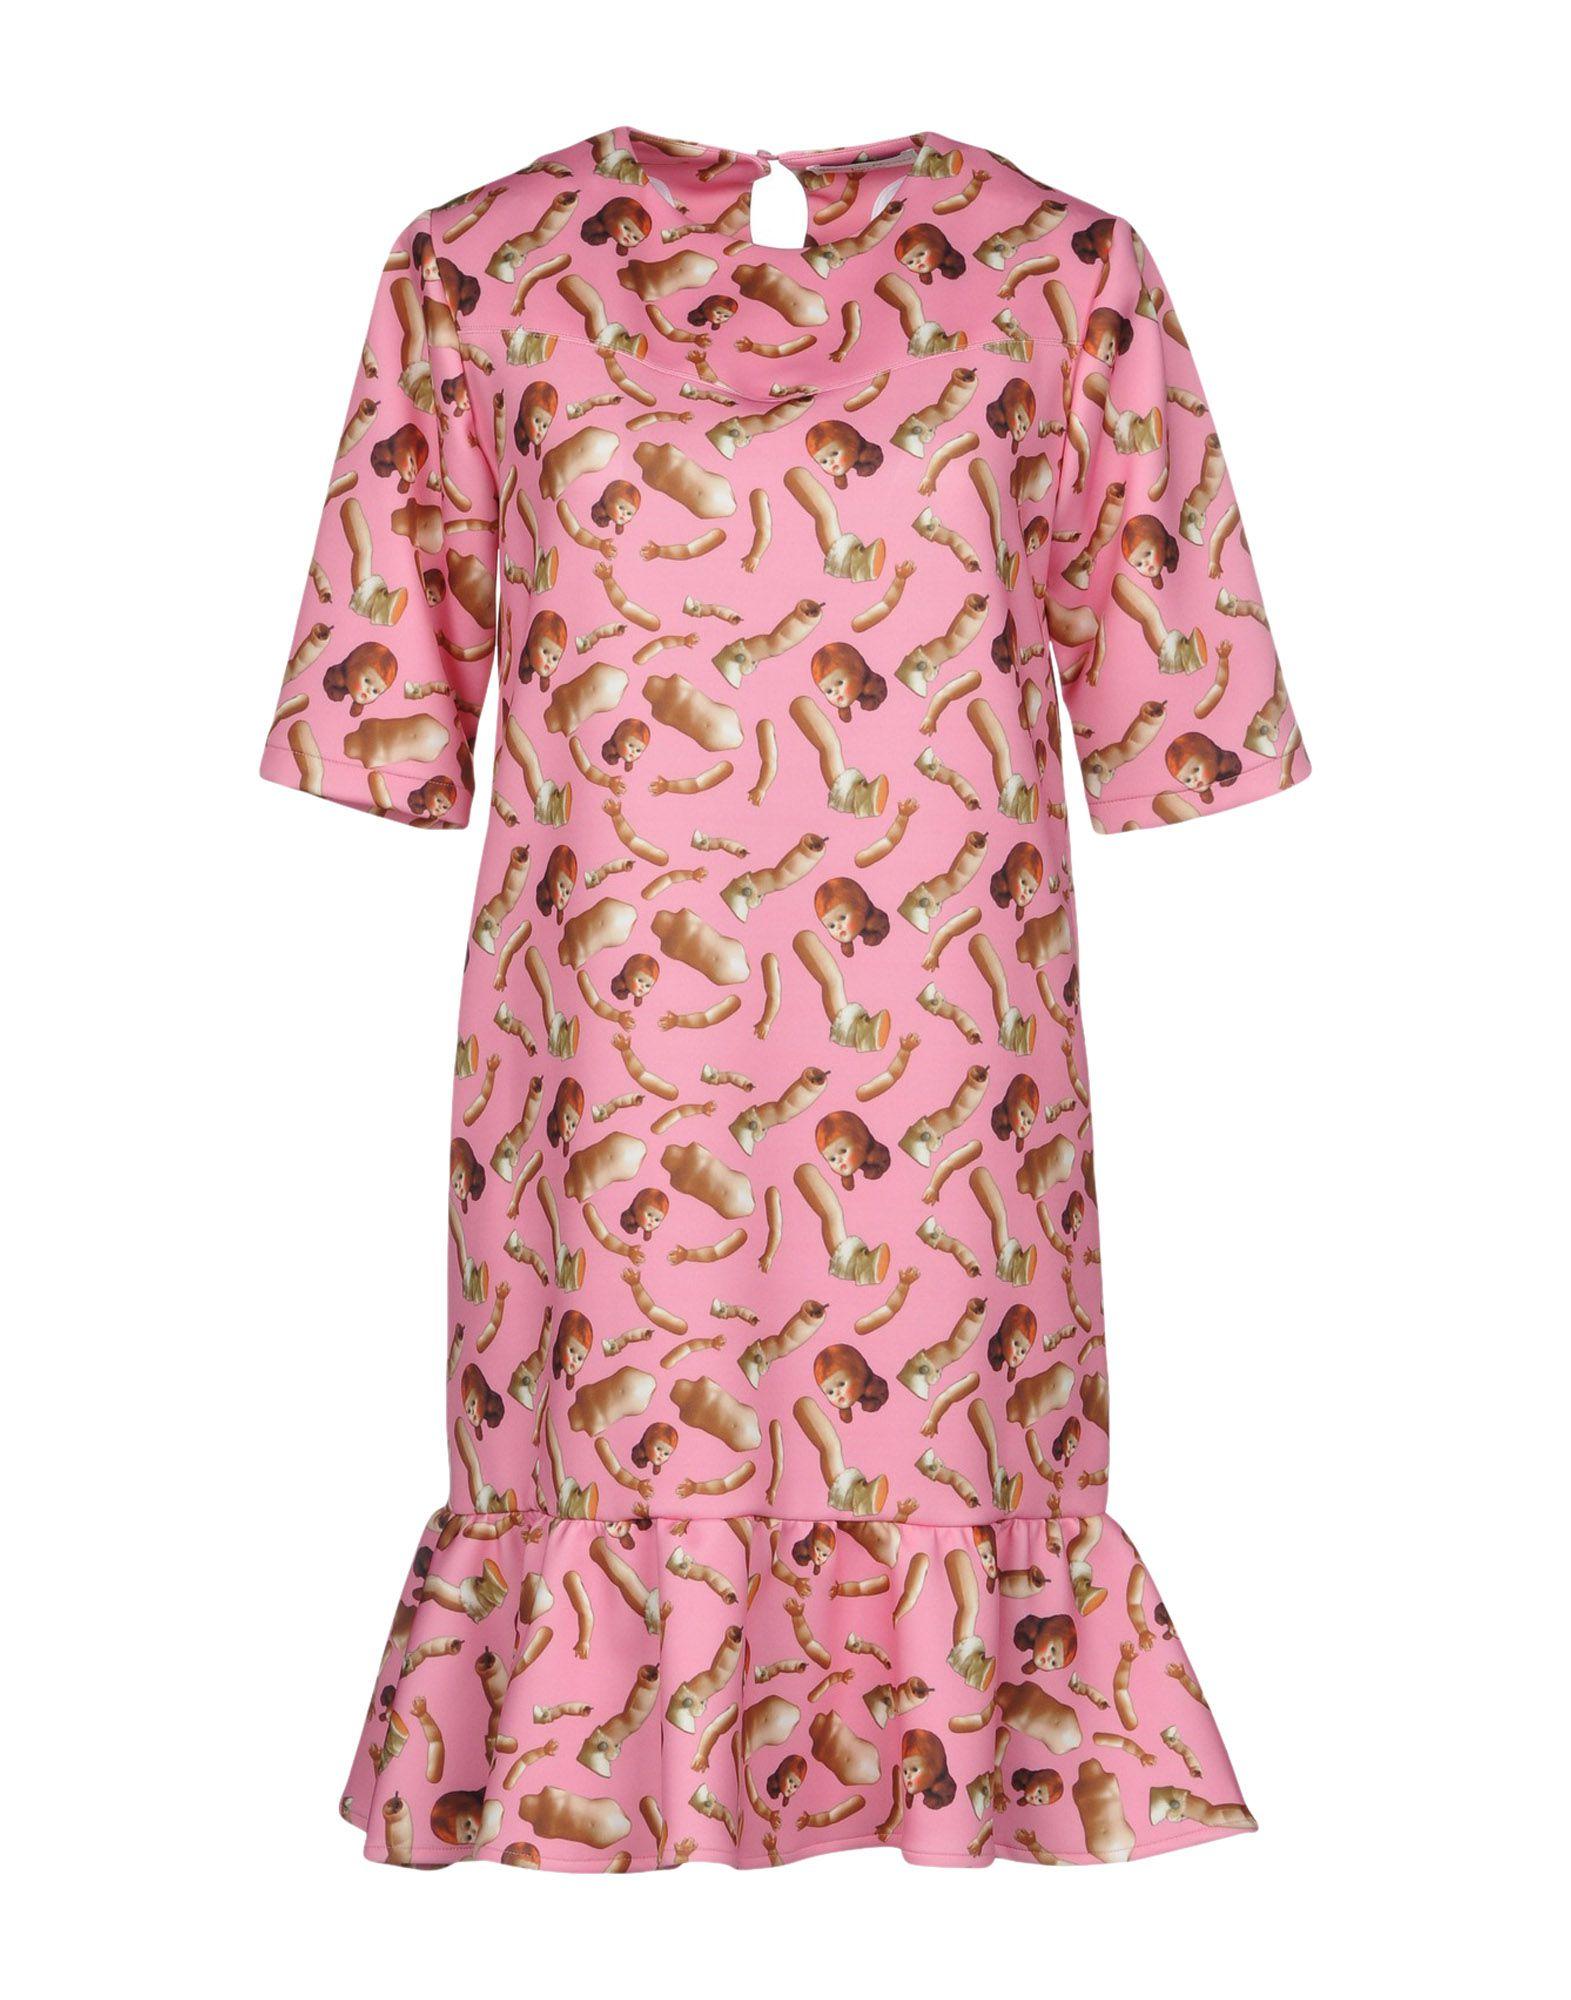 GIORGIA FIORE Short Dress in Pink